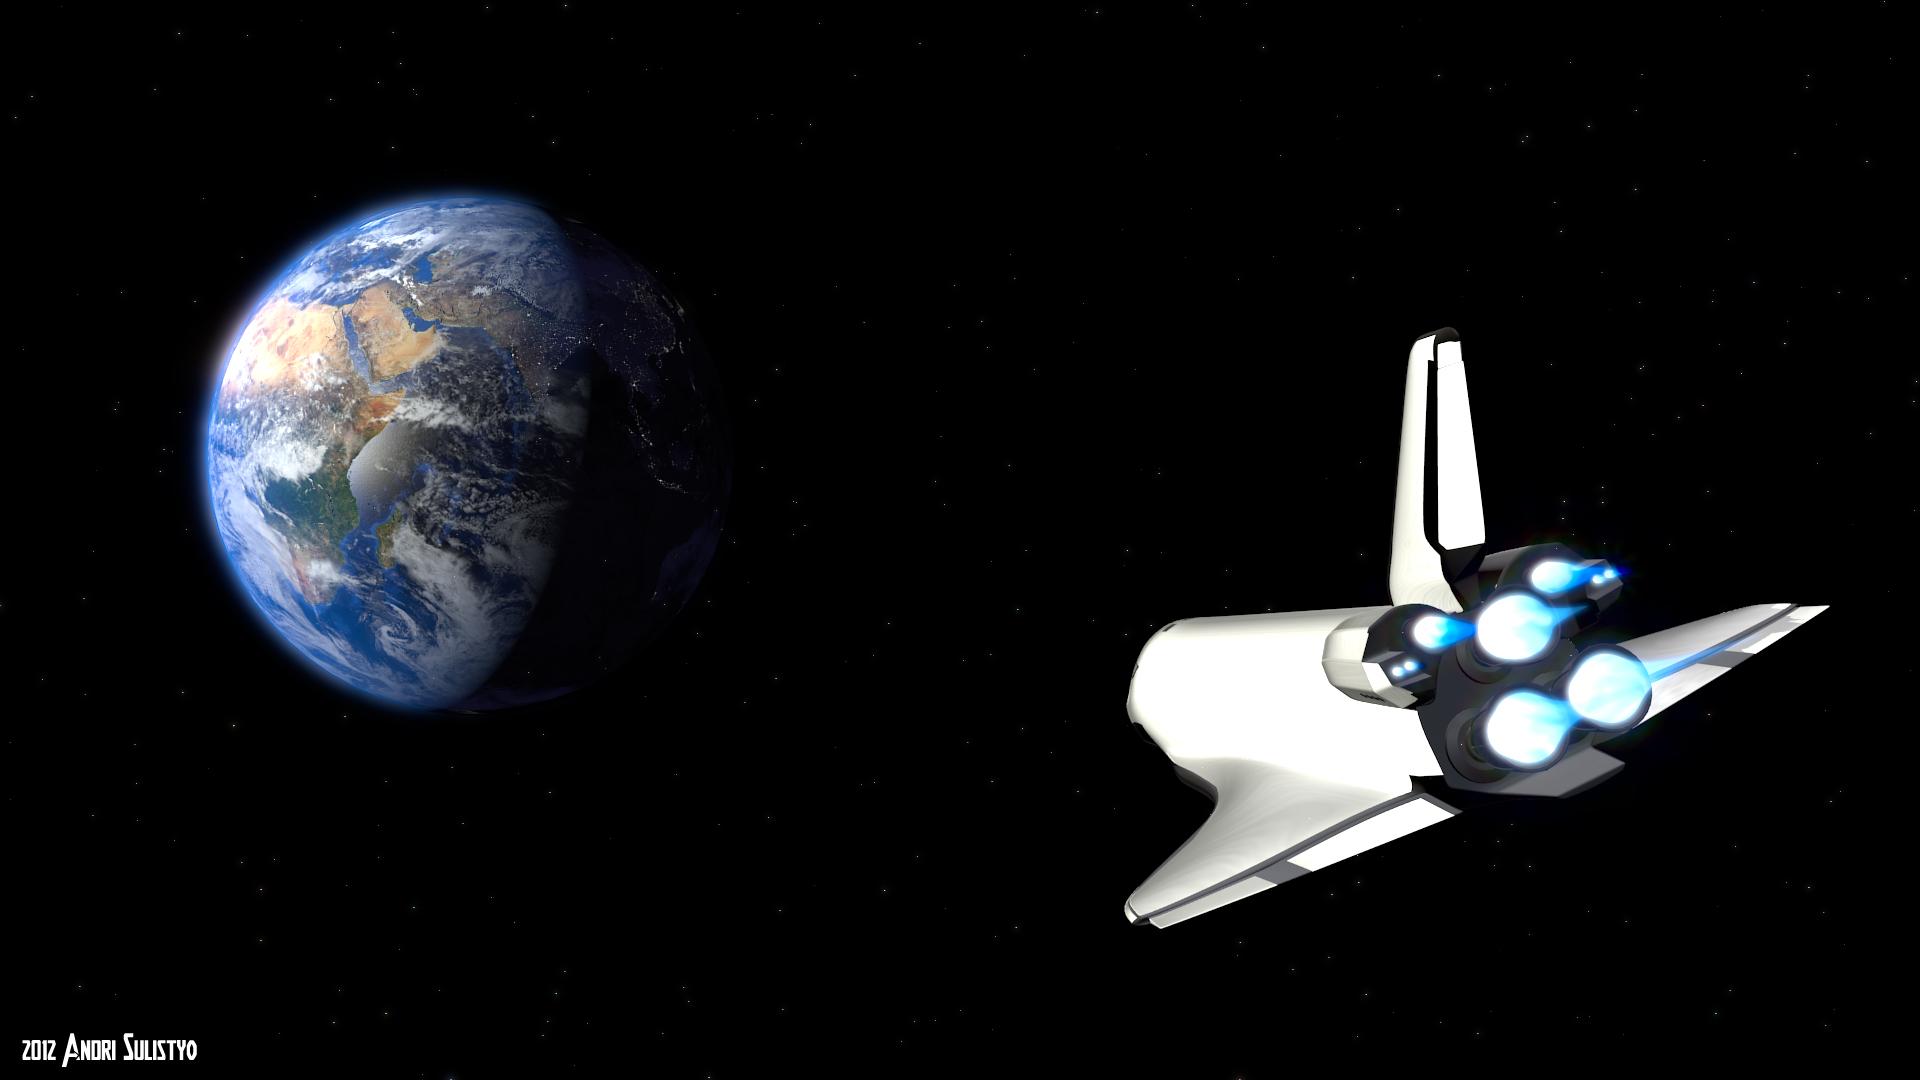 spaceman art 3d design - photo #3